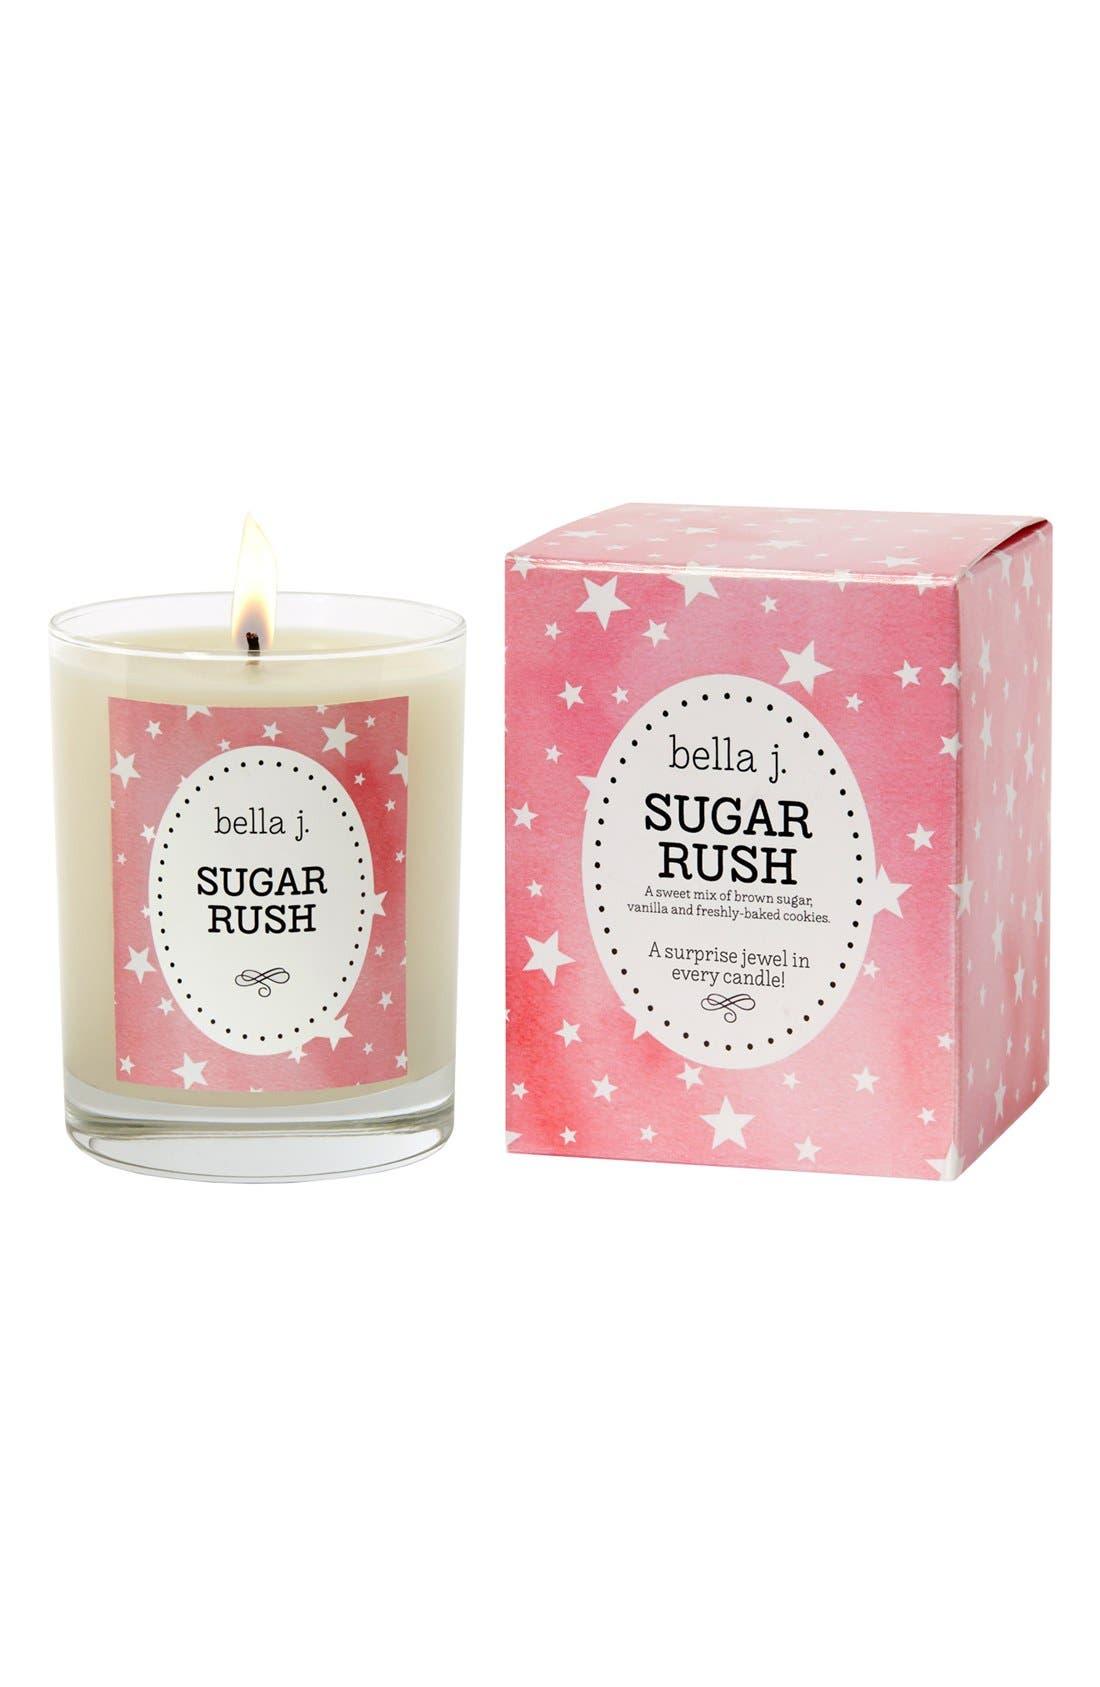 Main Image - bella j. 'Sugar Rush' Candle